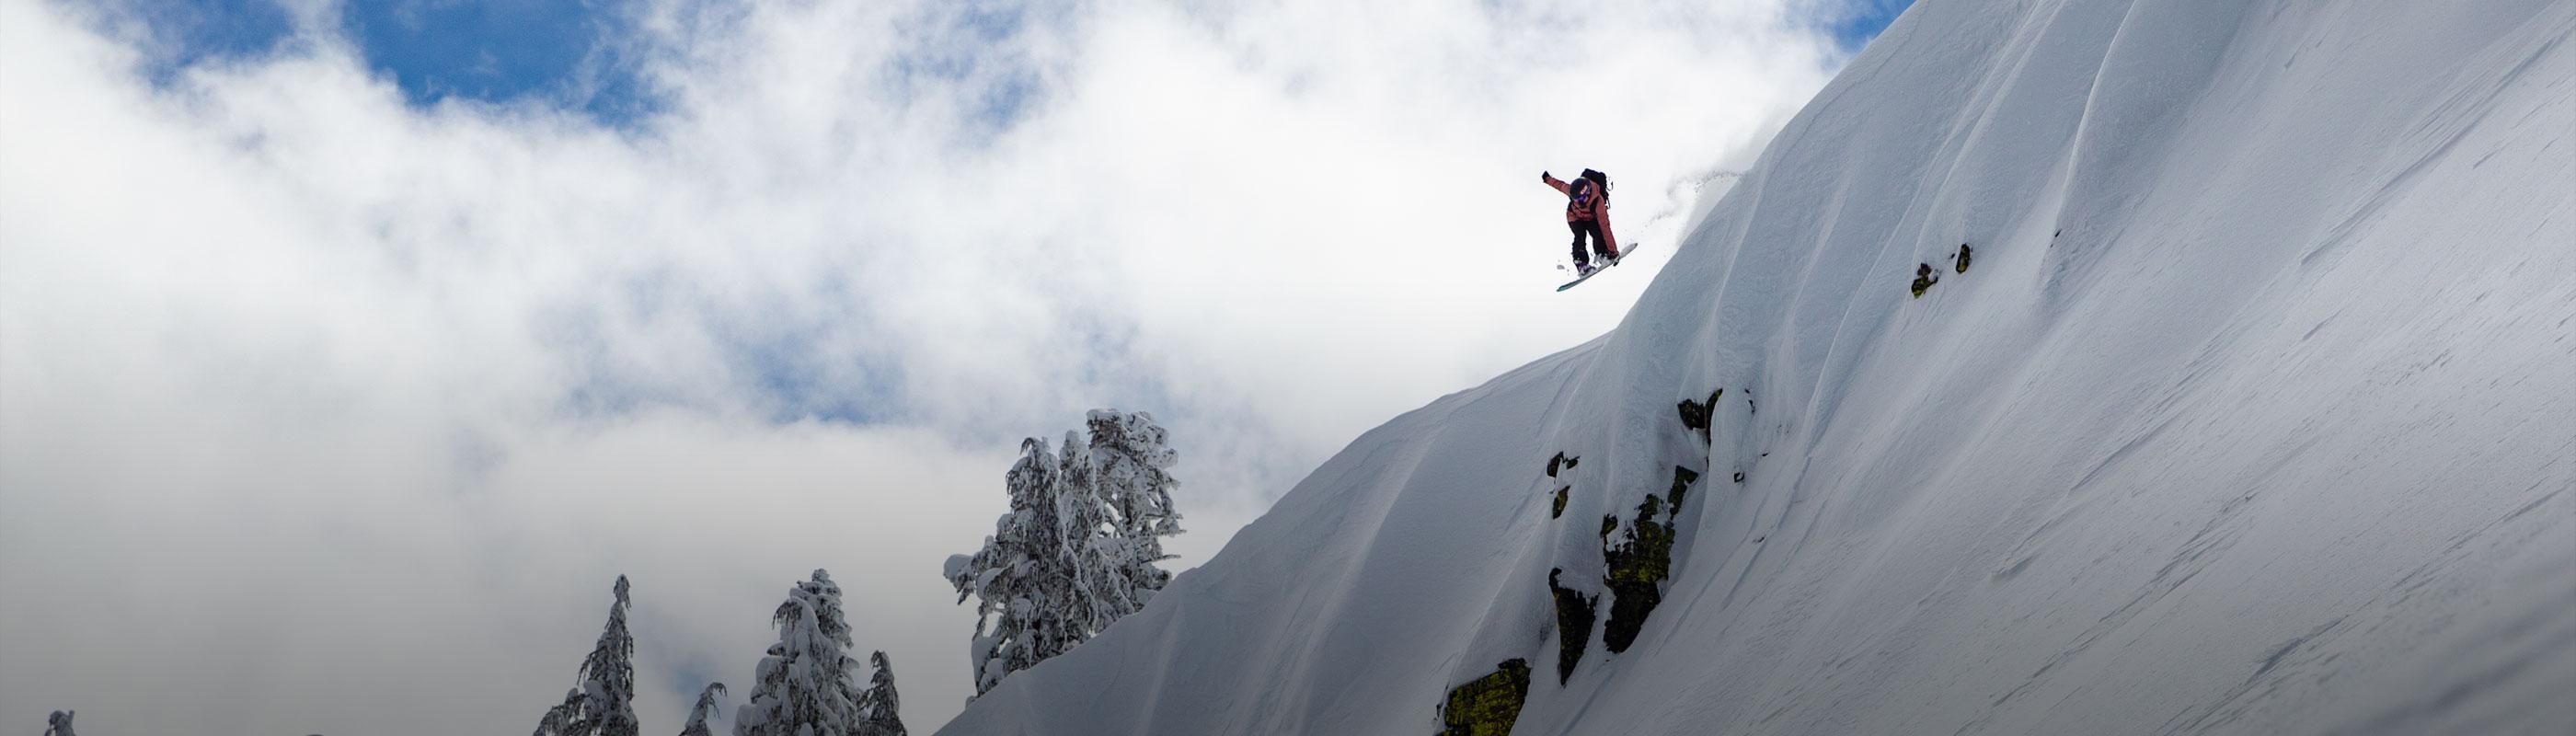 womens-directional-allmountain-snowboards